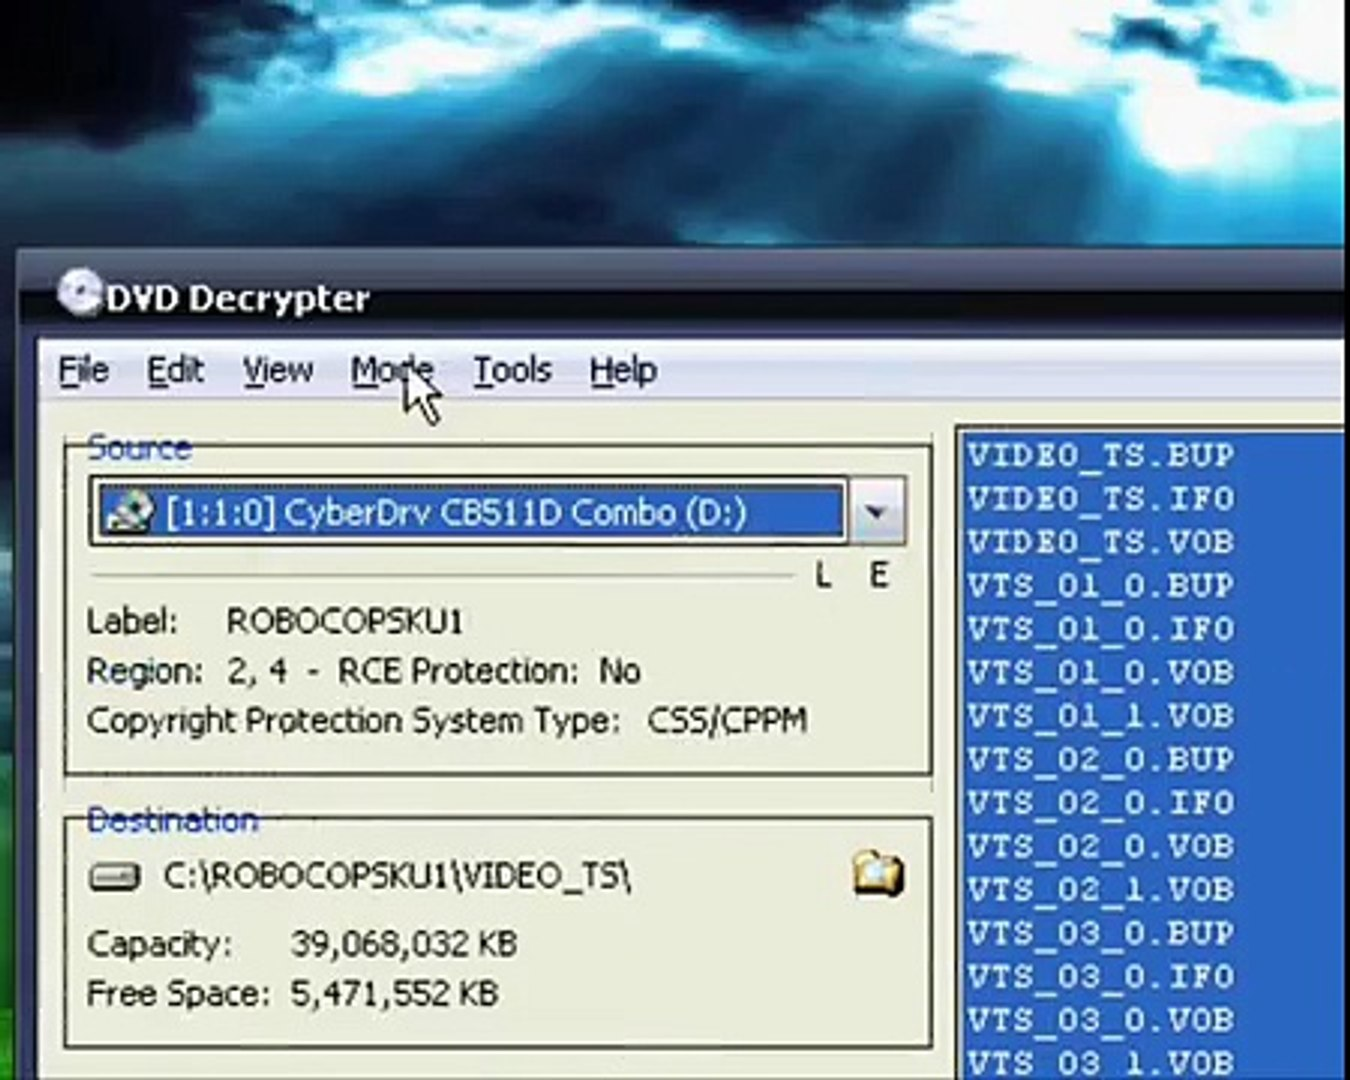 2007-03-16 - RRUU - CONVERT DVD TO AVI (DIVX/XVID) WITH DVD DECRYPTER &  VIDOMI